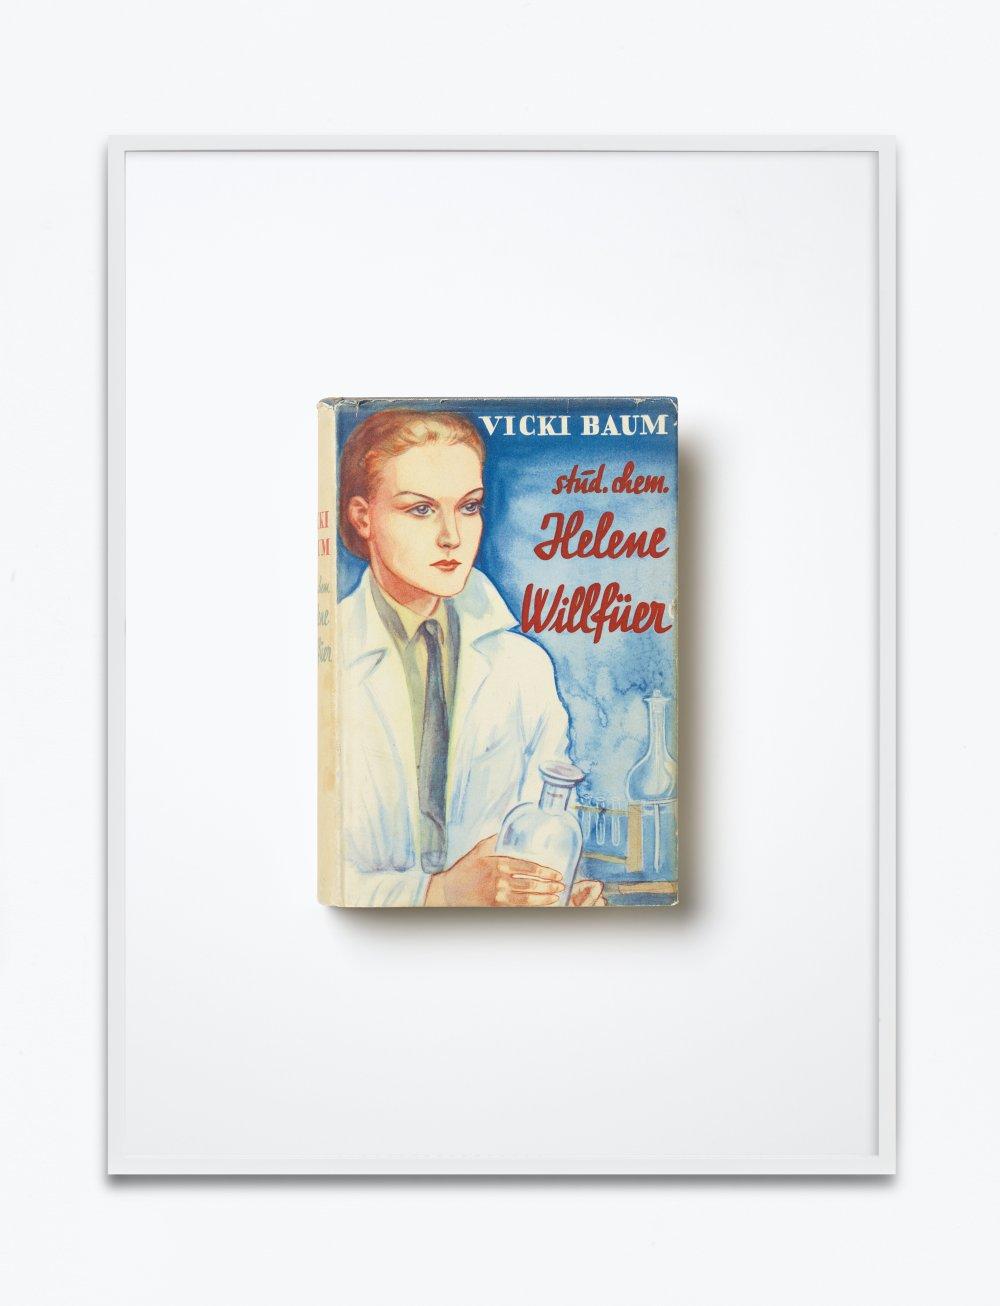 Vicki Baum, stud. chem. Helene Willfüer, 1928, 71.-80. Tausend, Ullstein Verlag, Berlin